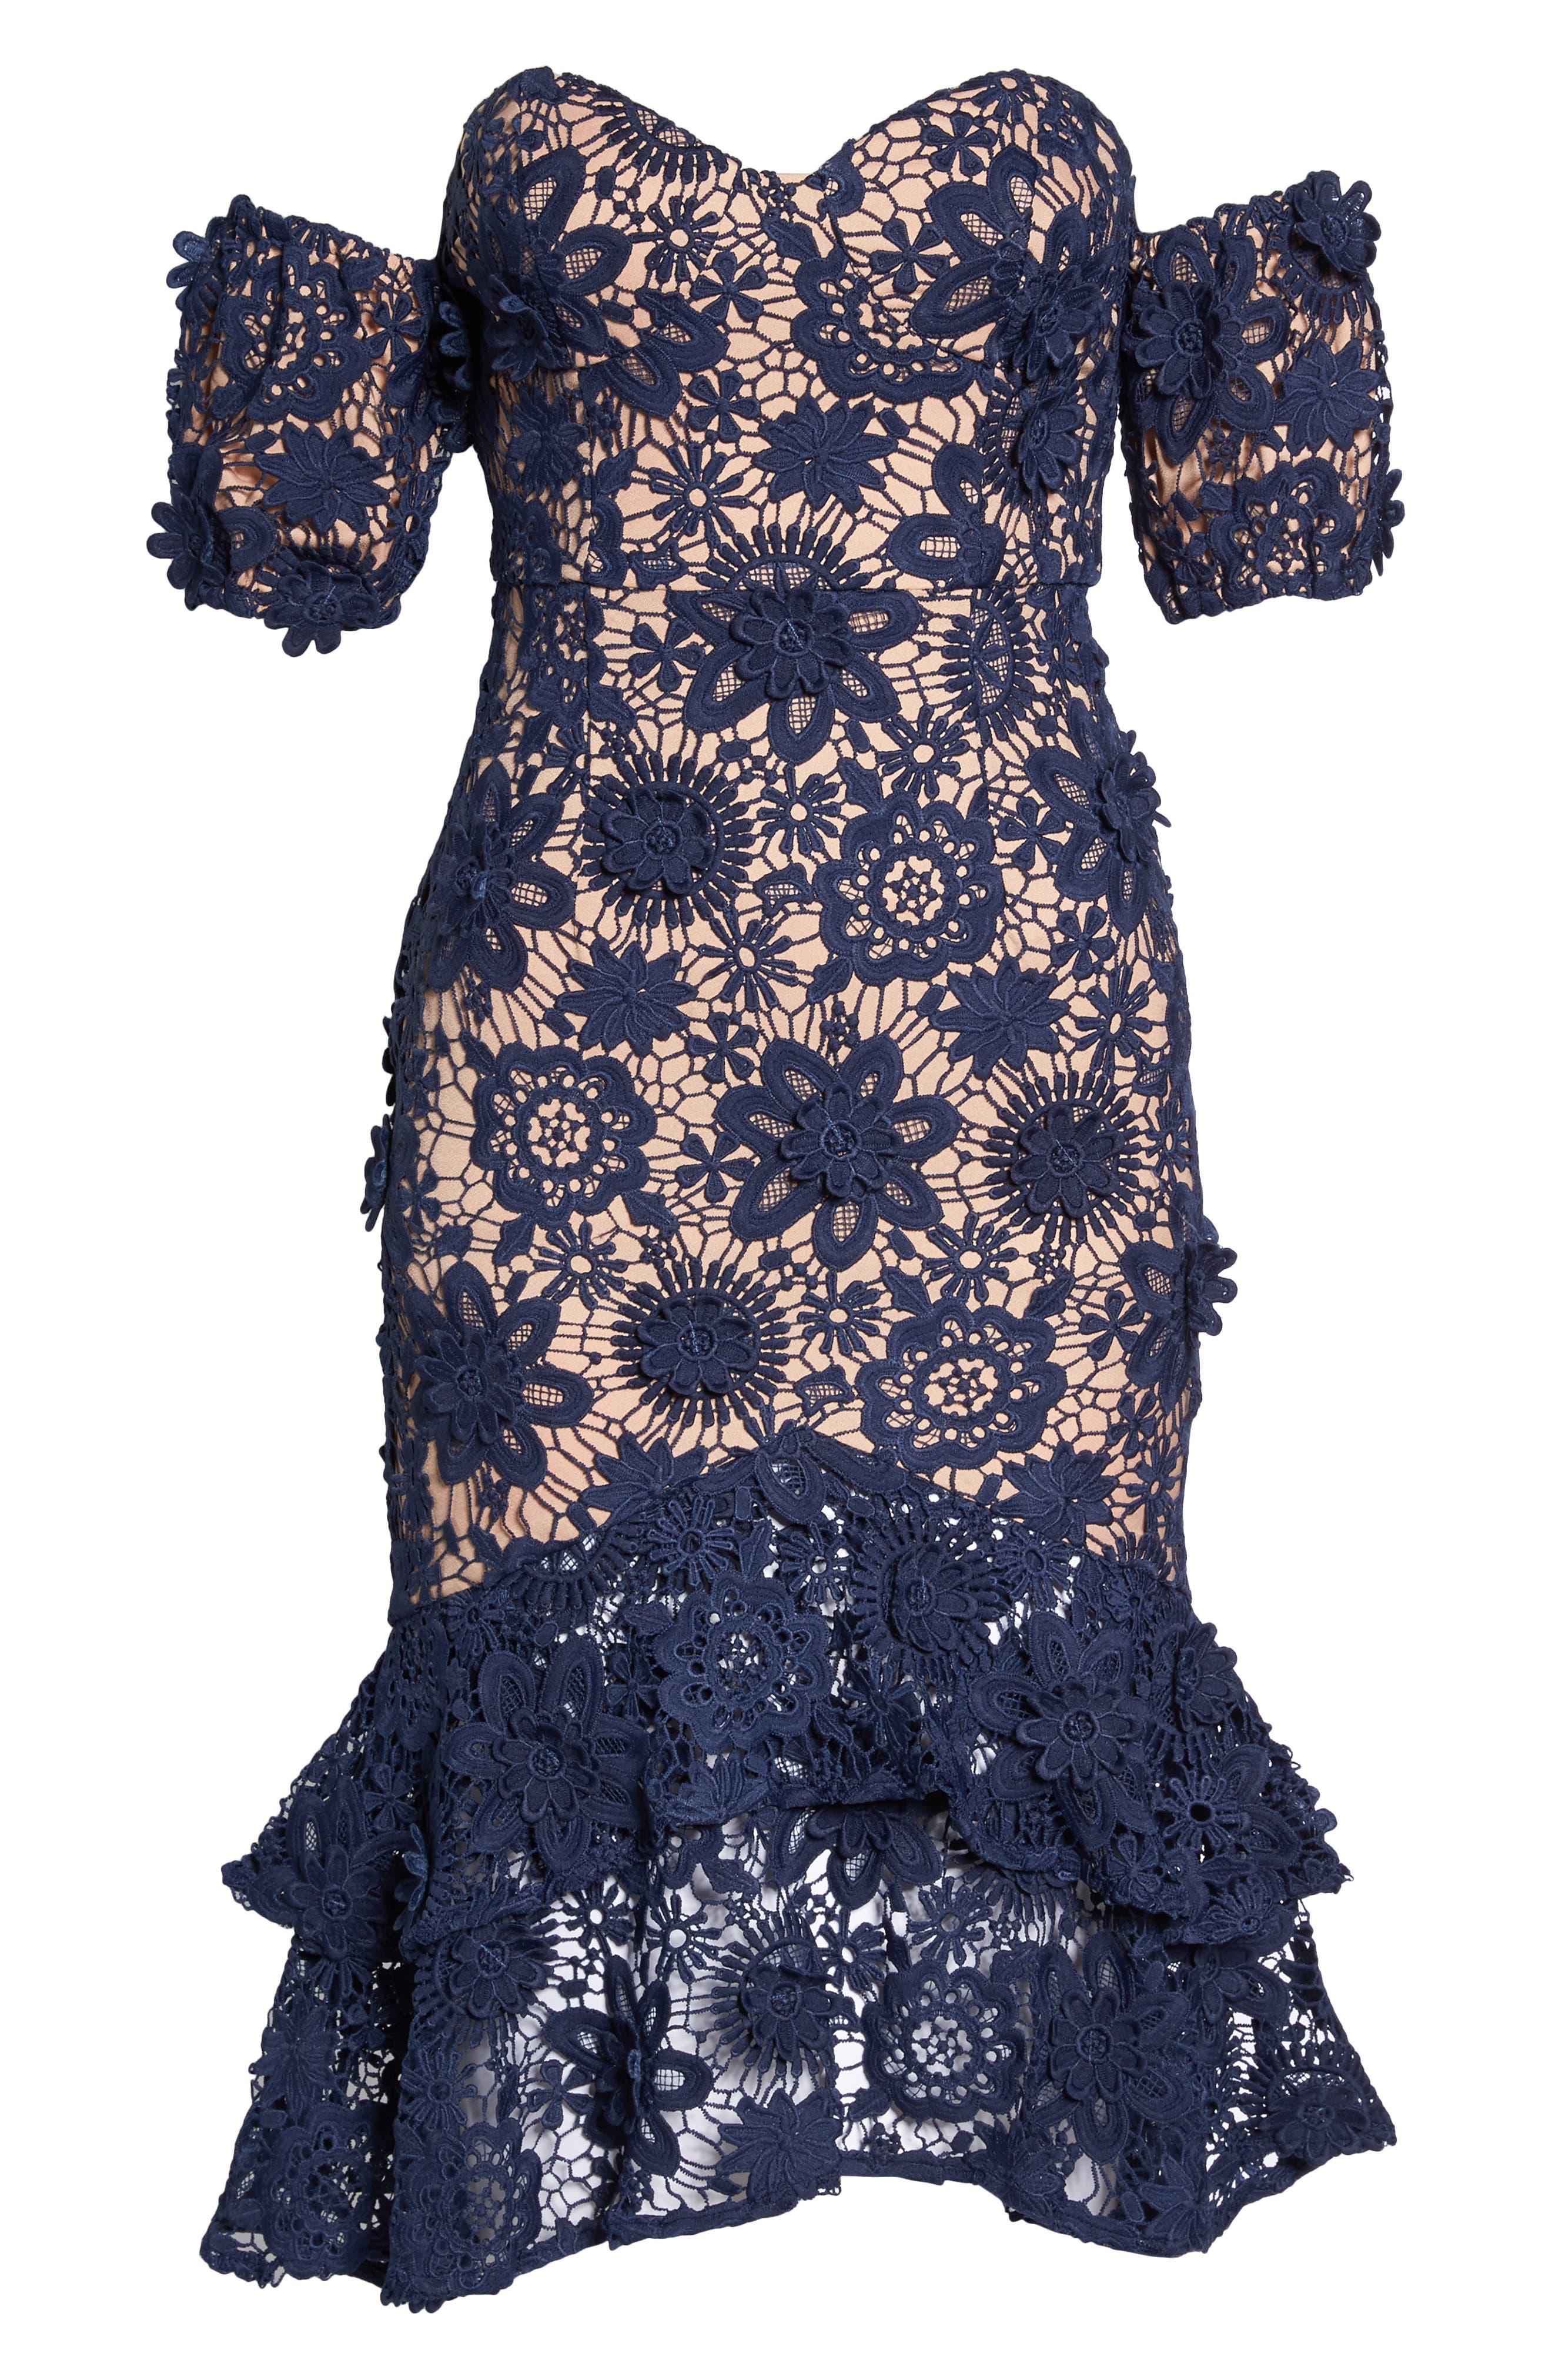 Merrilee Off the Shoulder 3D Lace Dress,                             Alternate thumbnail 6, color,                             NAVY